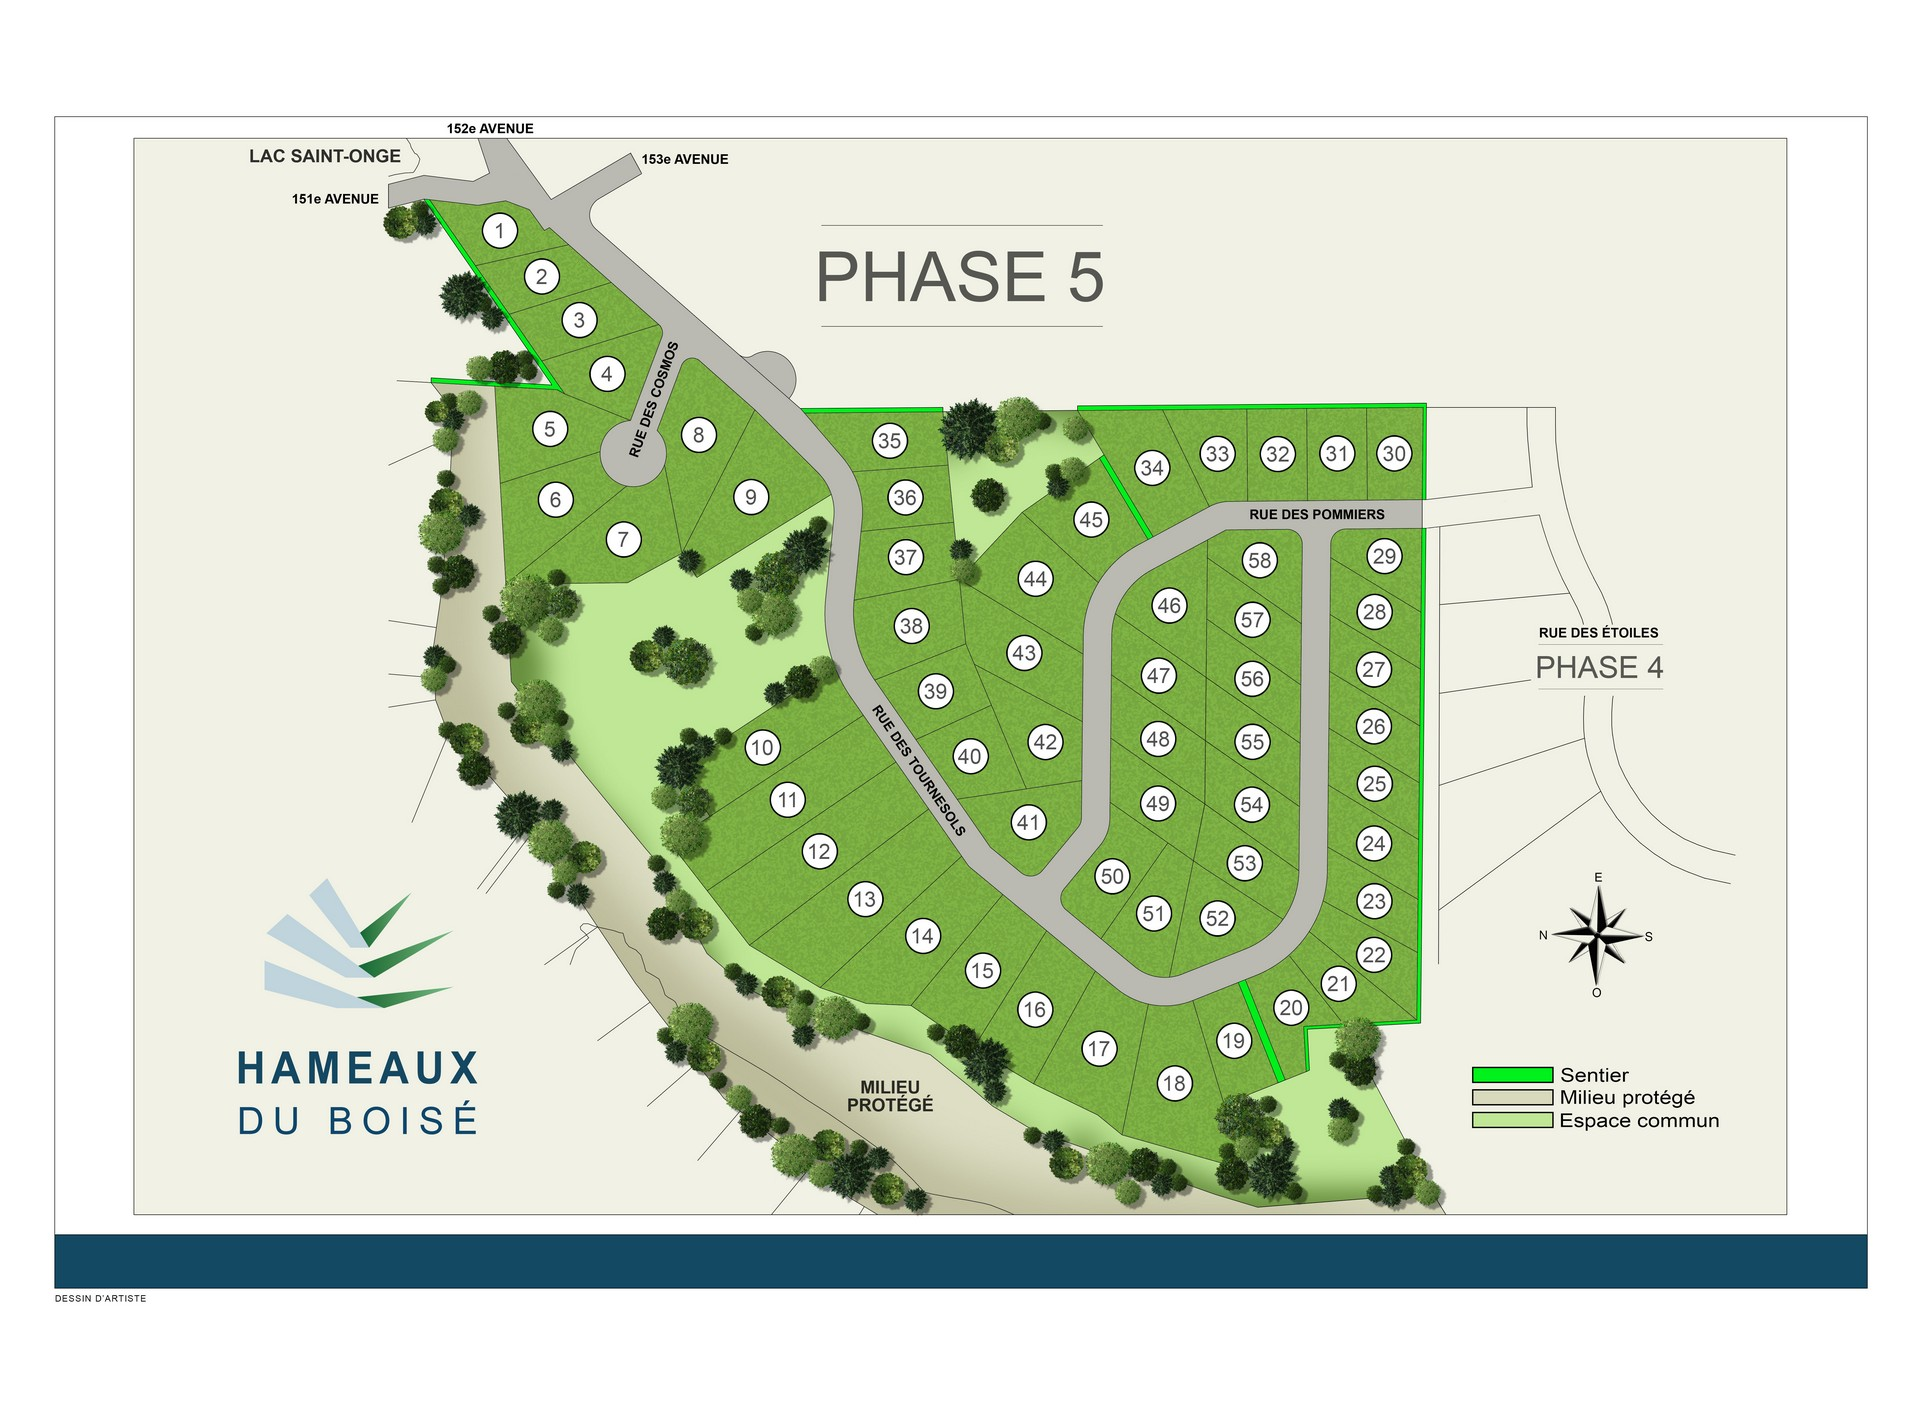 Plan de site phase 5